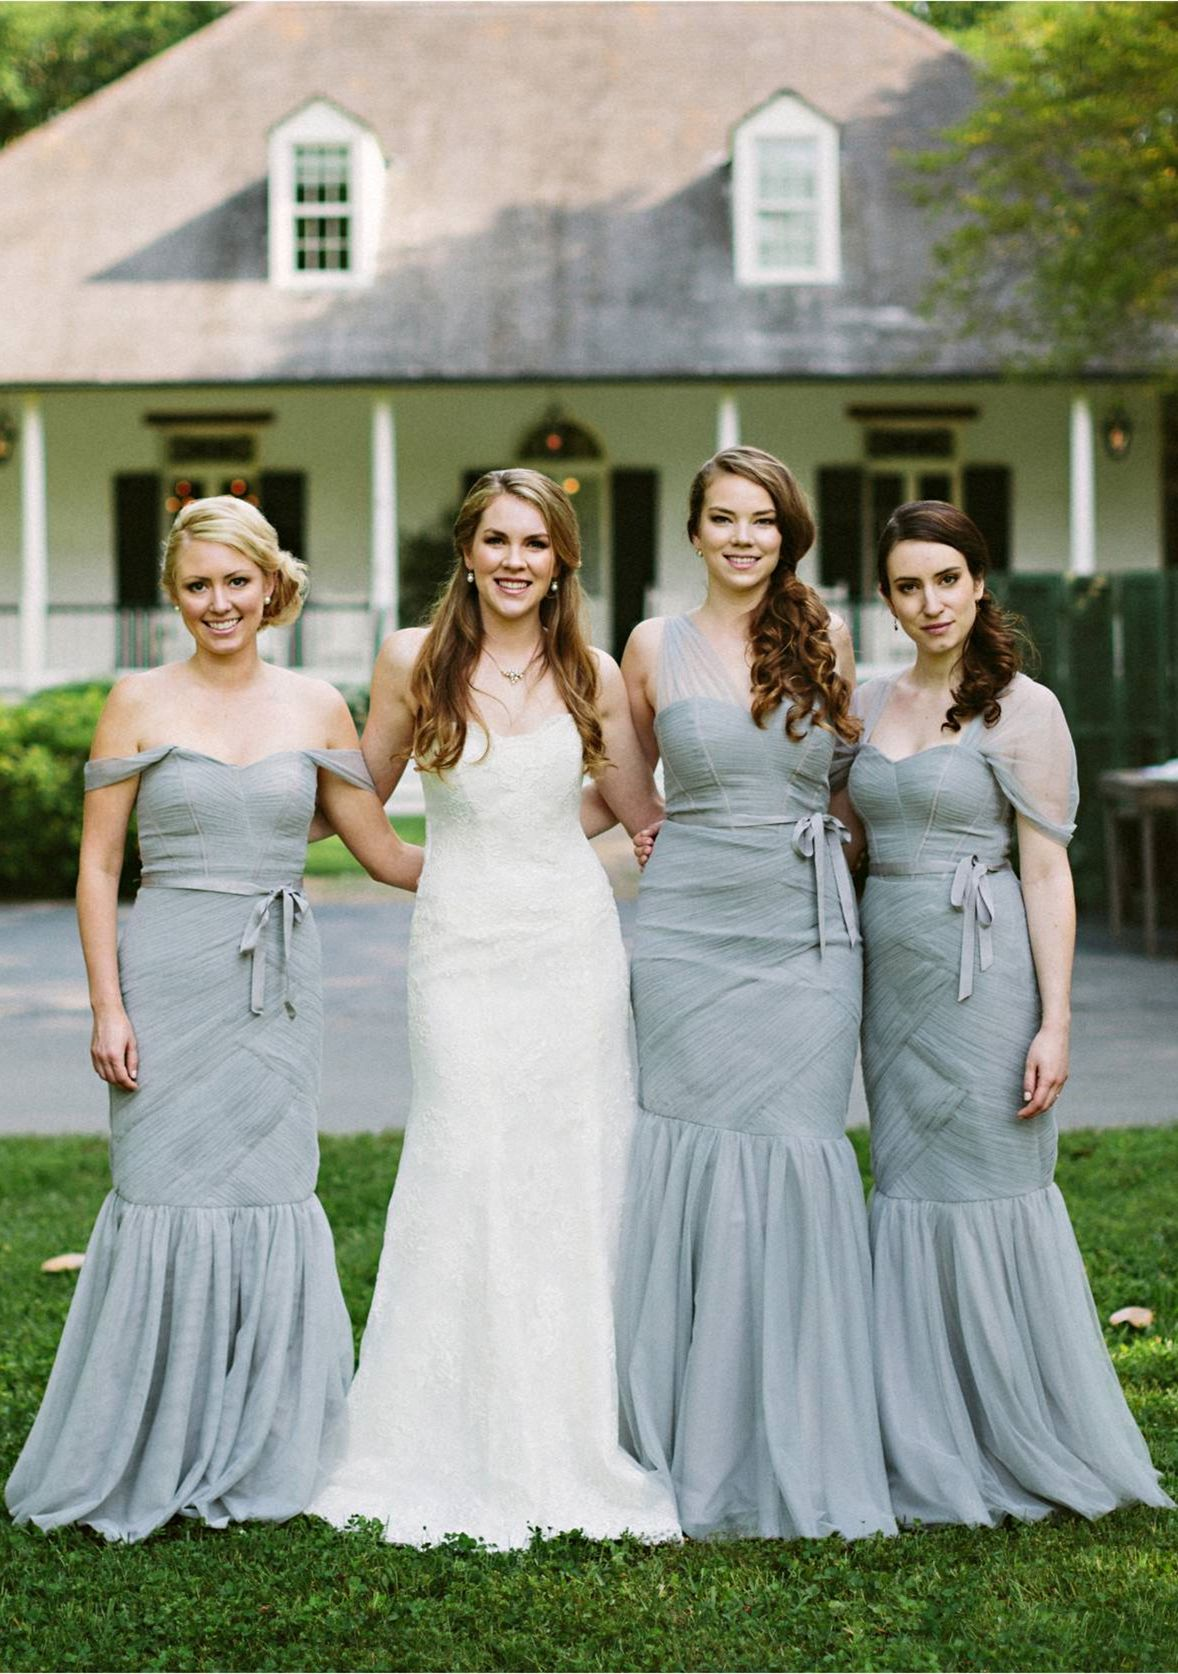 93d33974557 Mermaid Off-the-Shoulder Long Sage Bridesmaid Dress with Sash